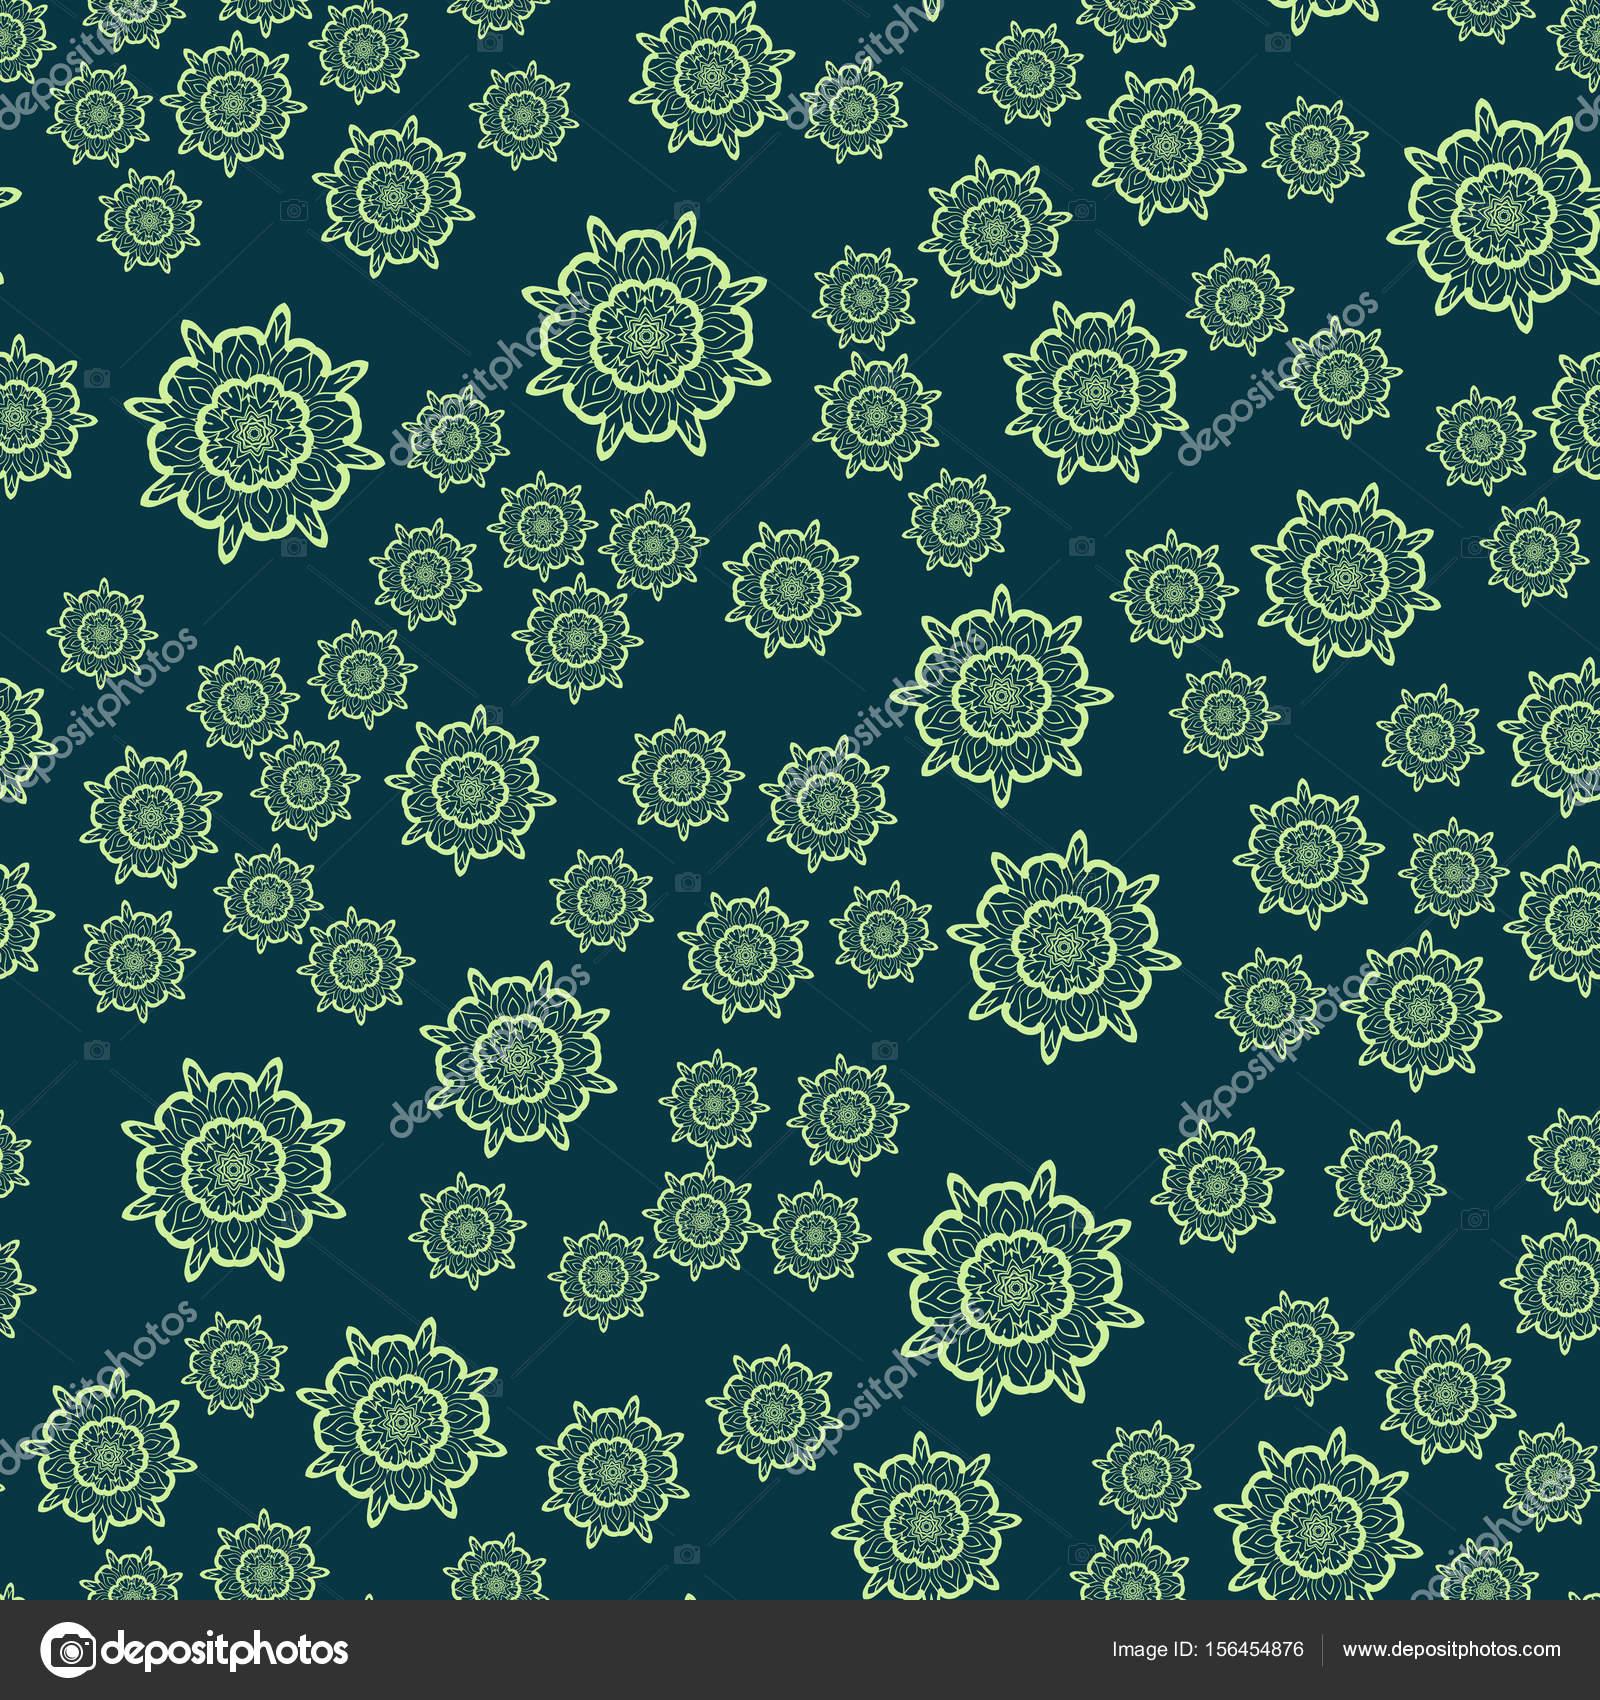 Mandala flor verde oscuro transparente para la impresión de materia ...